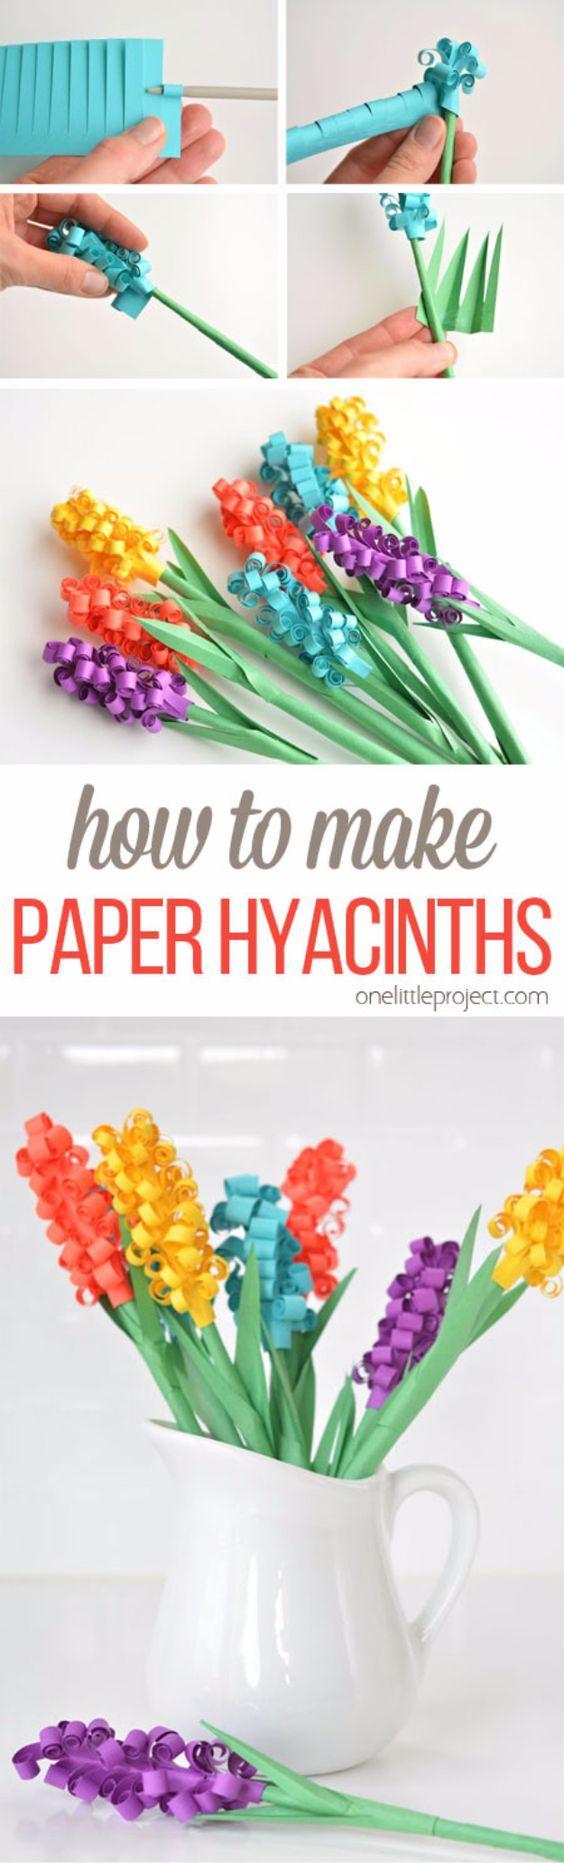 41 of the Easiest DIYs Ever!   Hyacinth flowers, Simple craft ideas ...